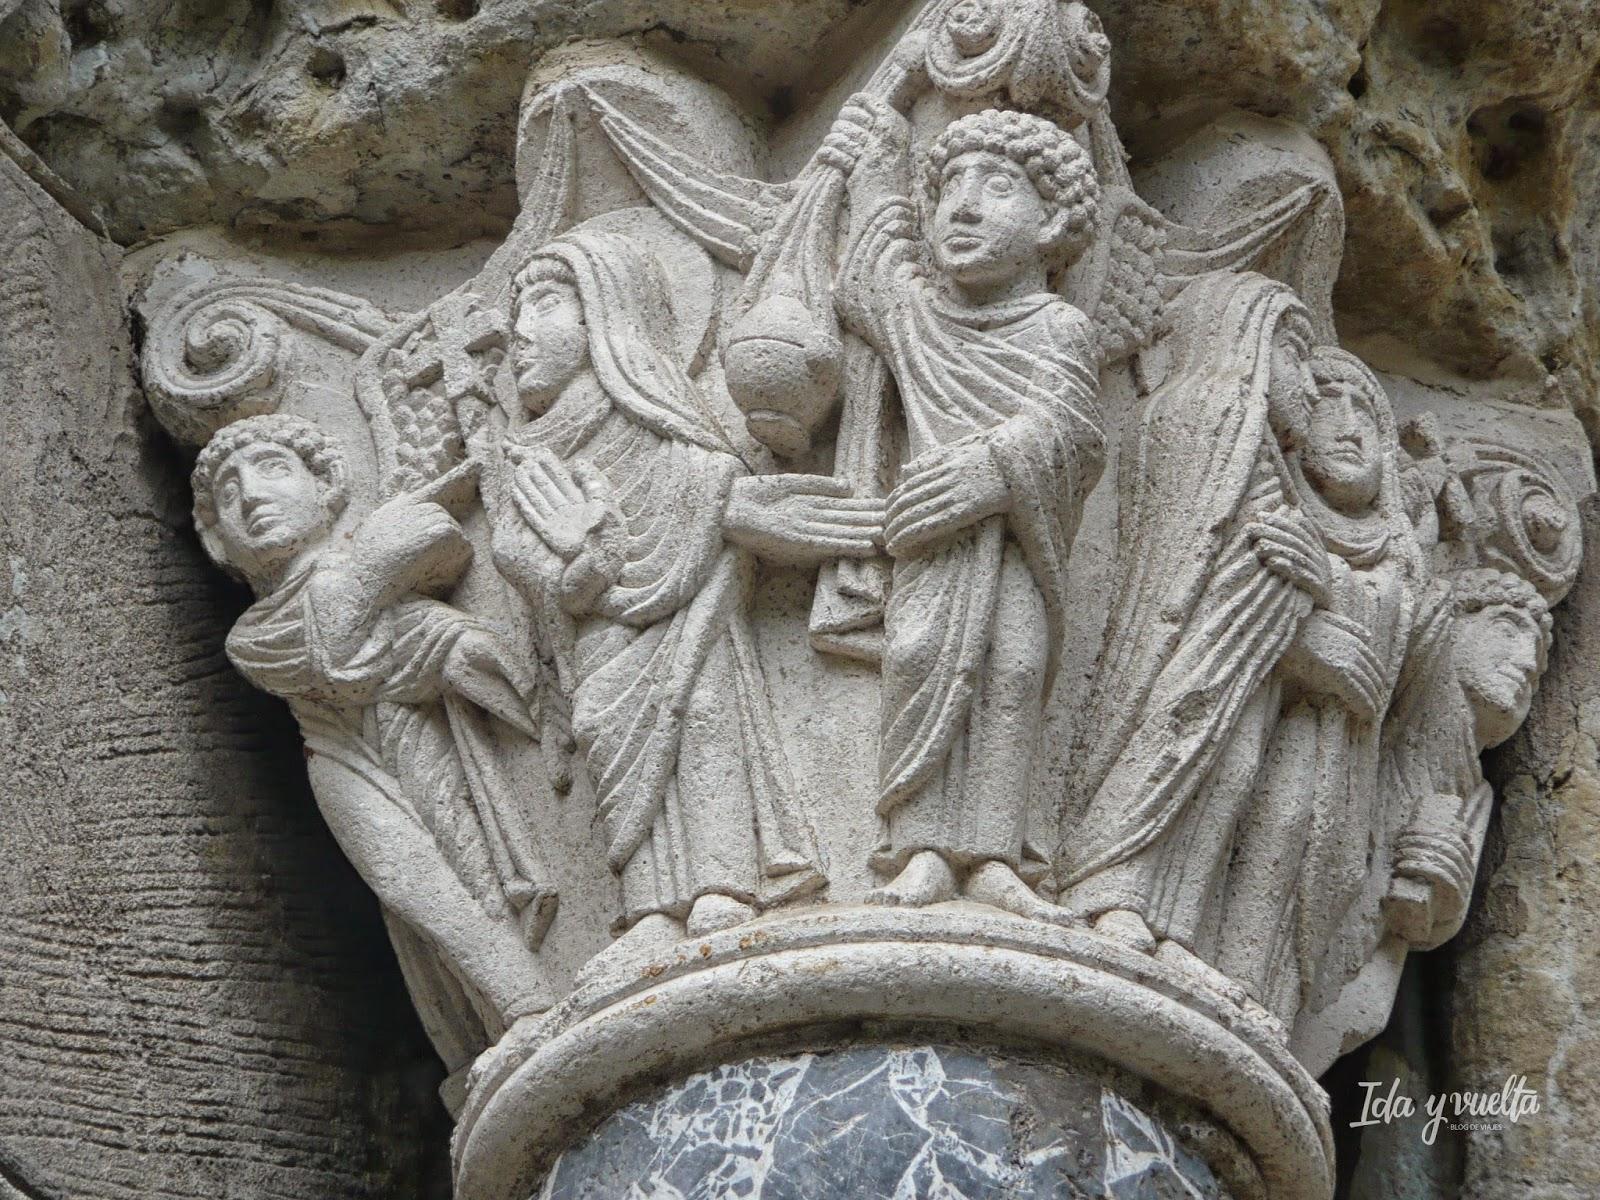 Capitel en Saint-Sernin en Toulouse